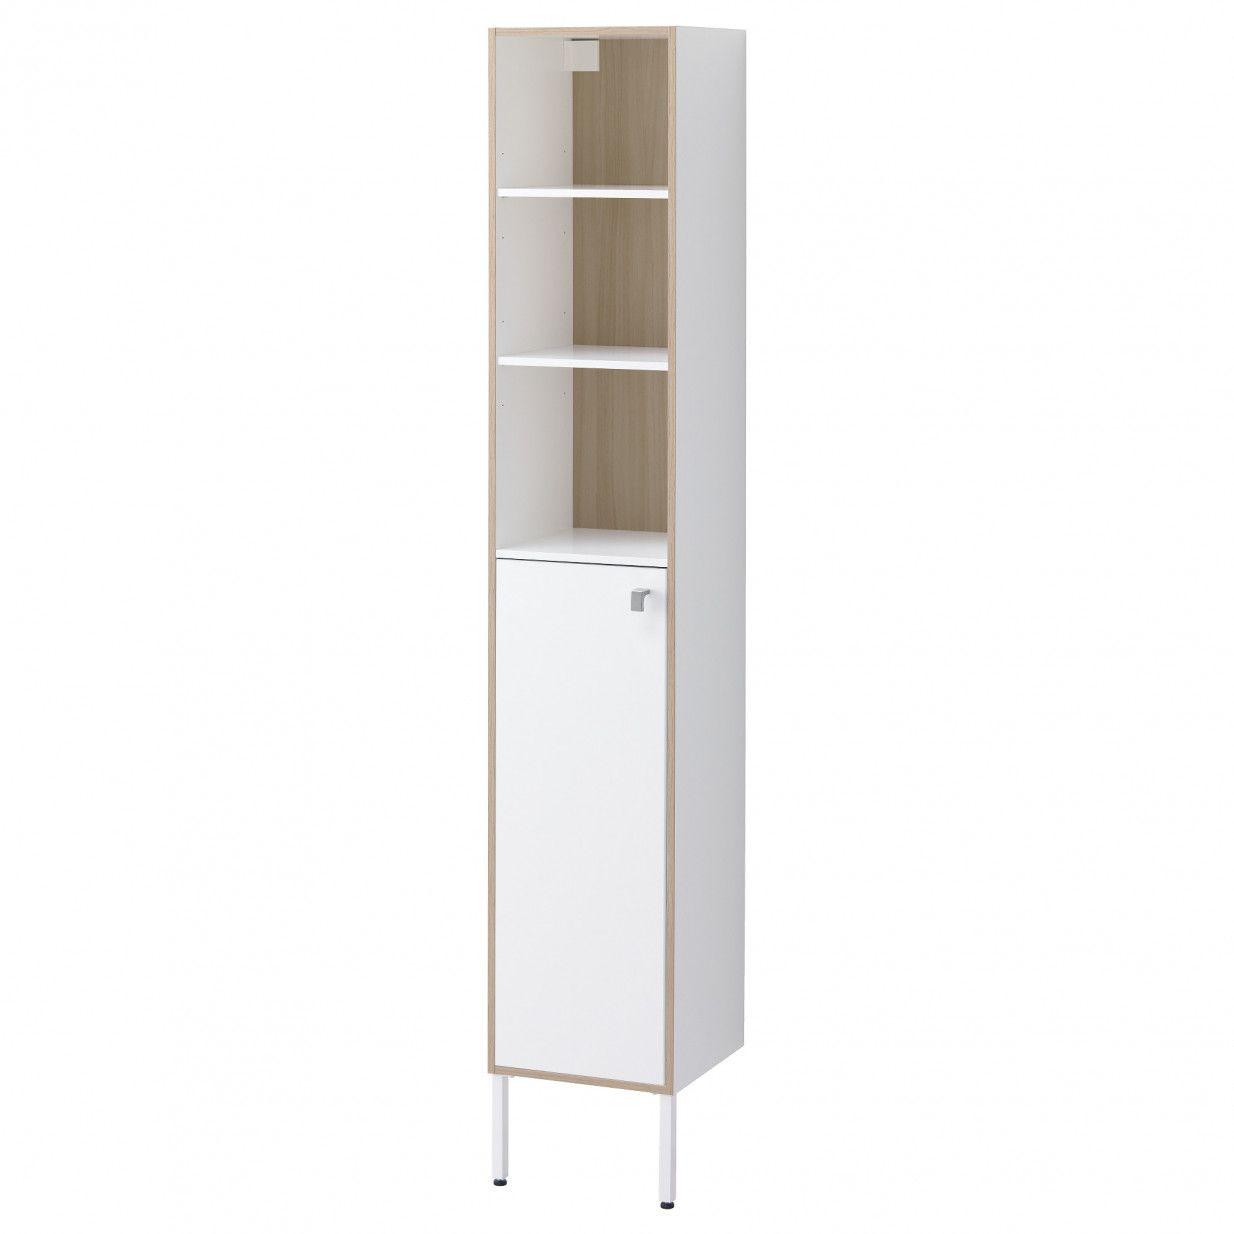 9+ Tall Bathroom Storage Cabinet Ikea - Favorite Interior Paint